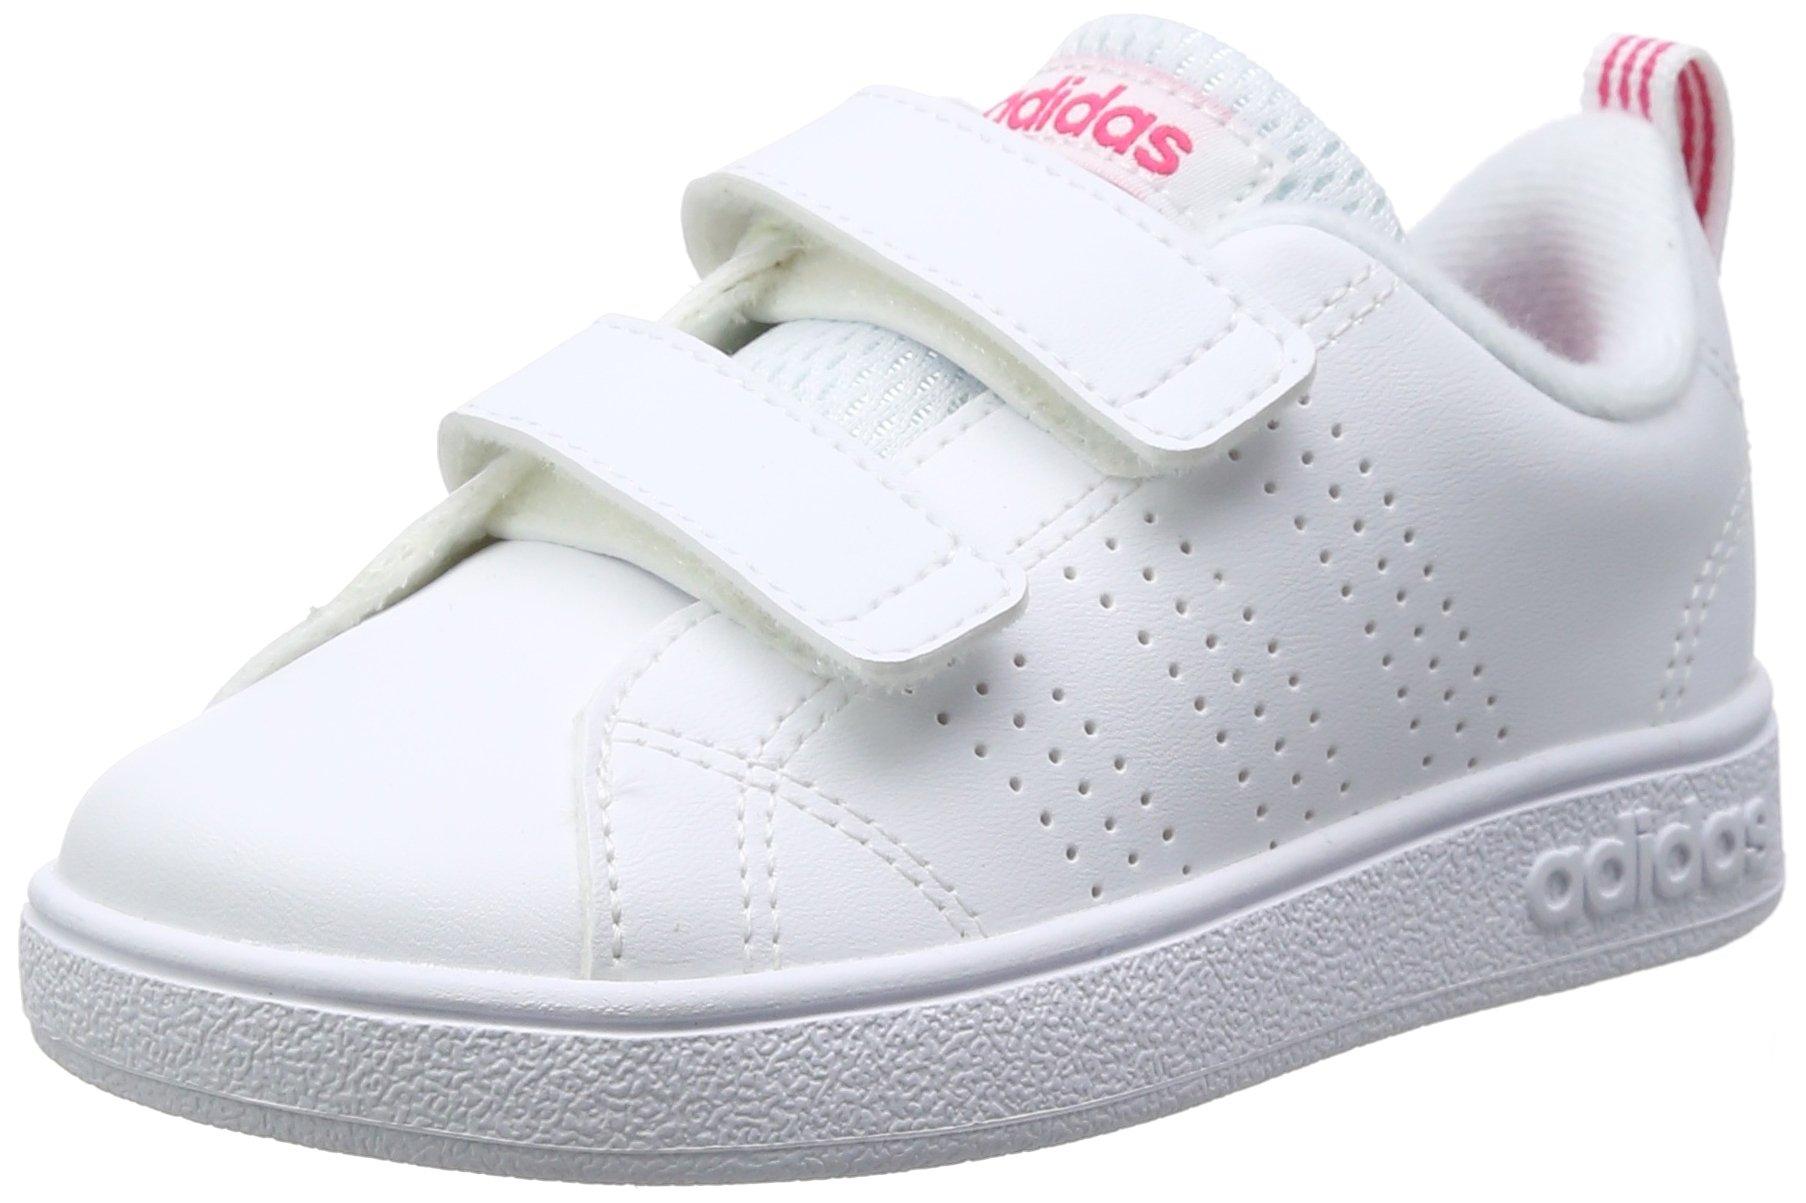 921da769d15d9 Adidas Vs Advantage Clean Cmf Inf Baskets Basses ...